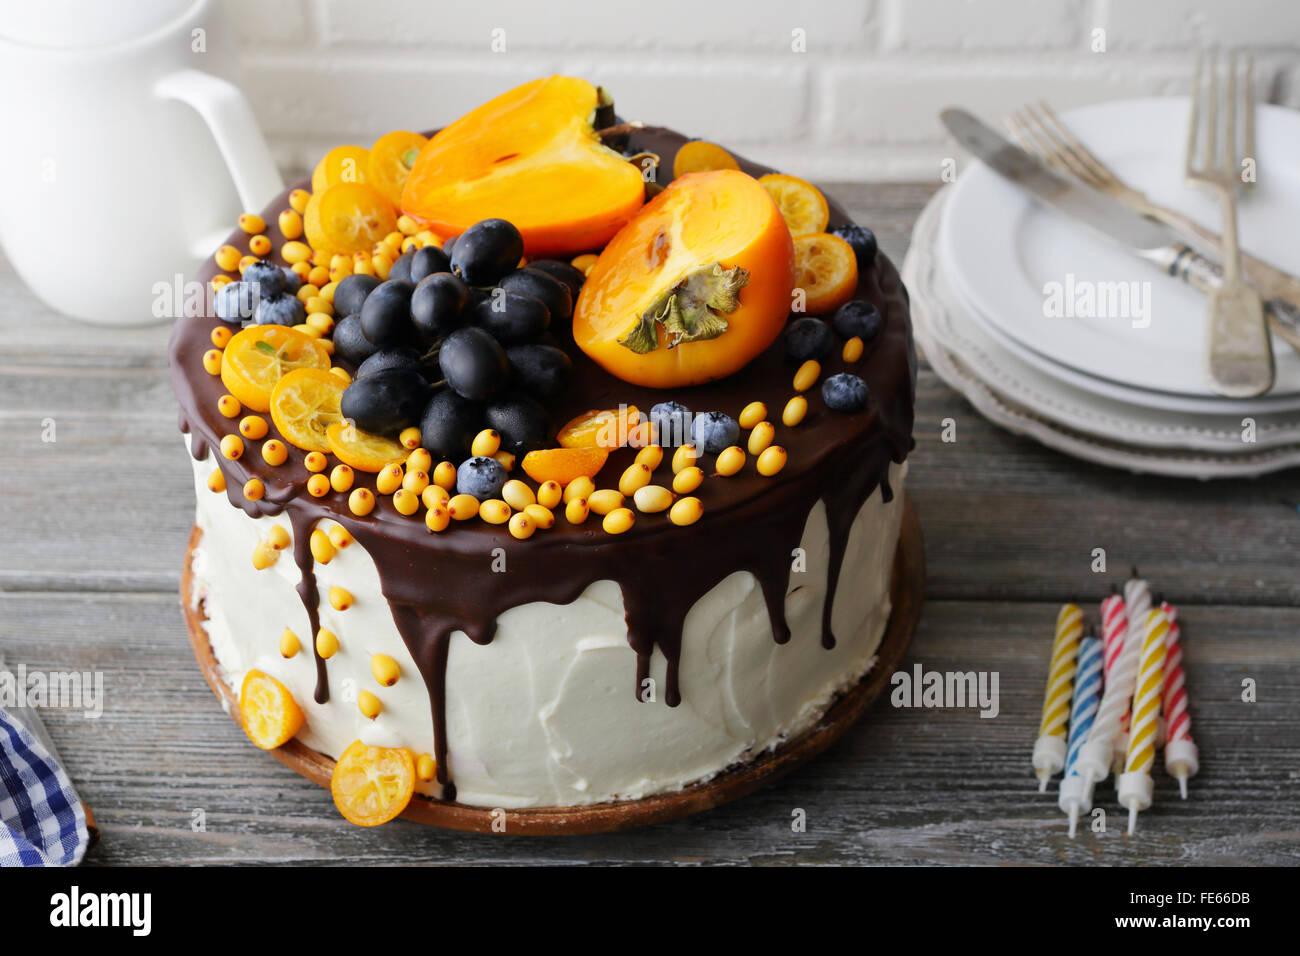 cake with fruits decorations, food closeup - Stock Image